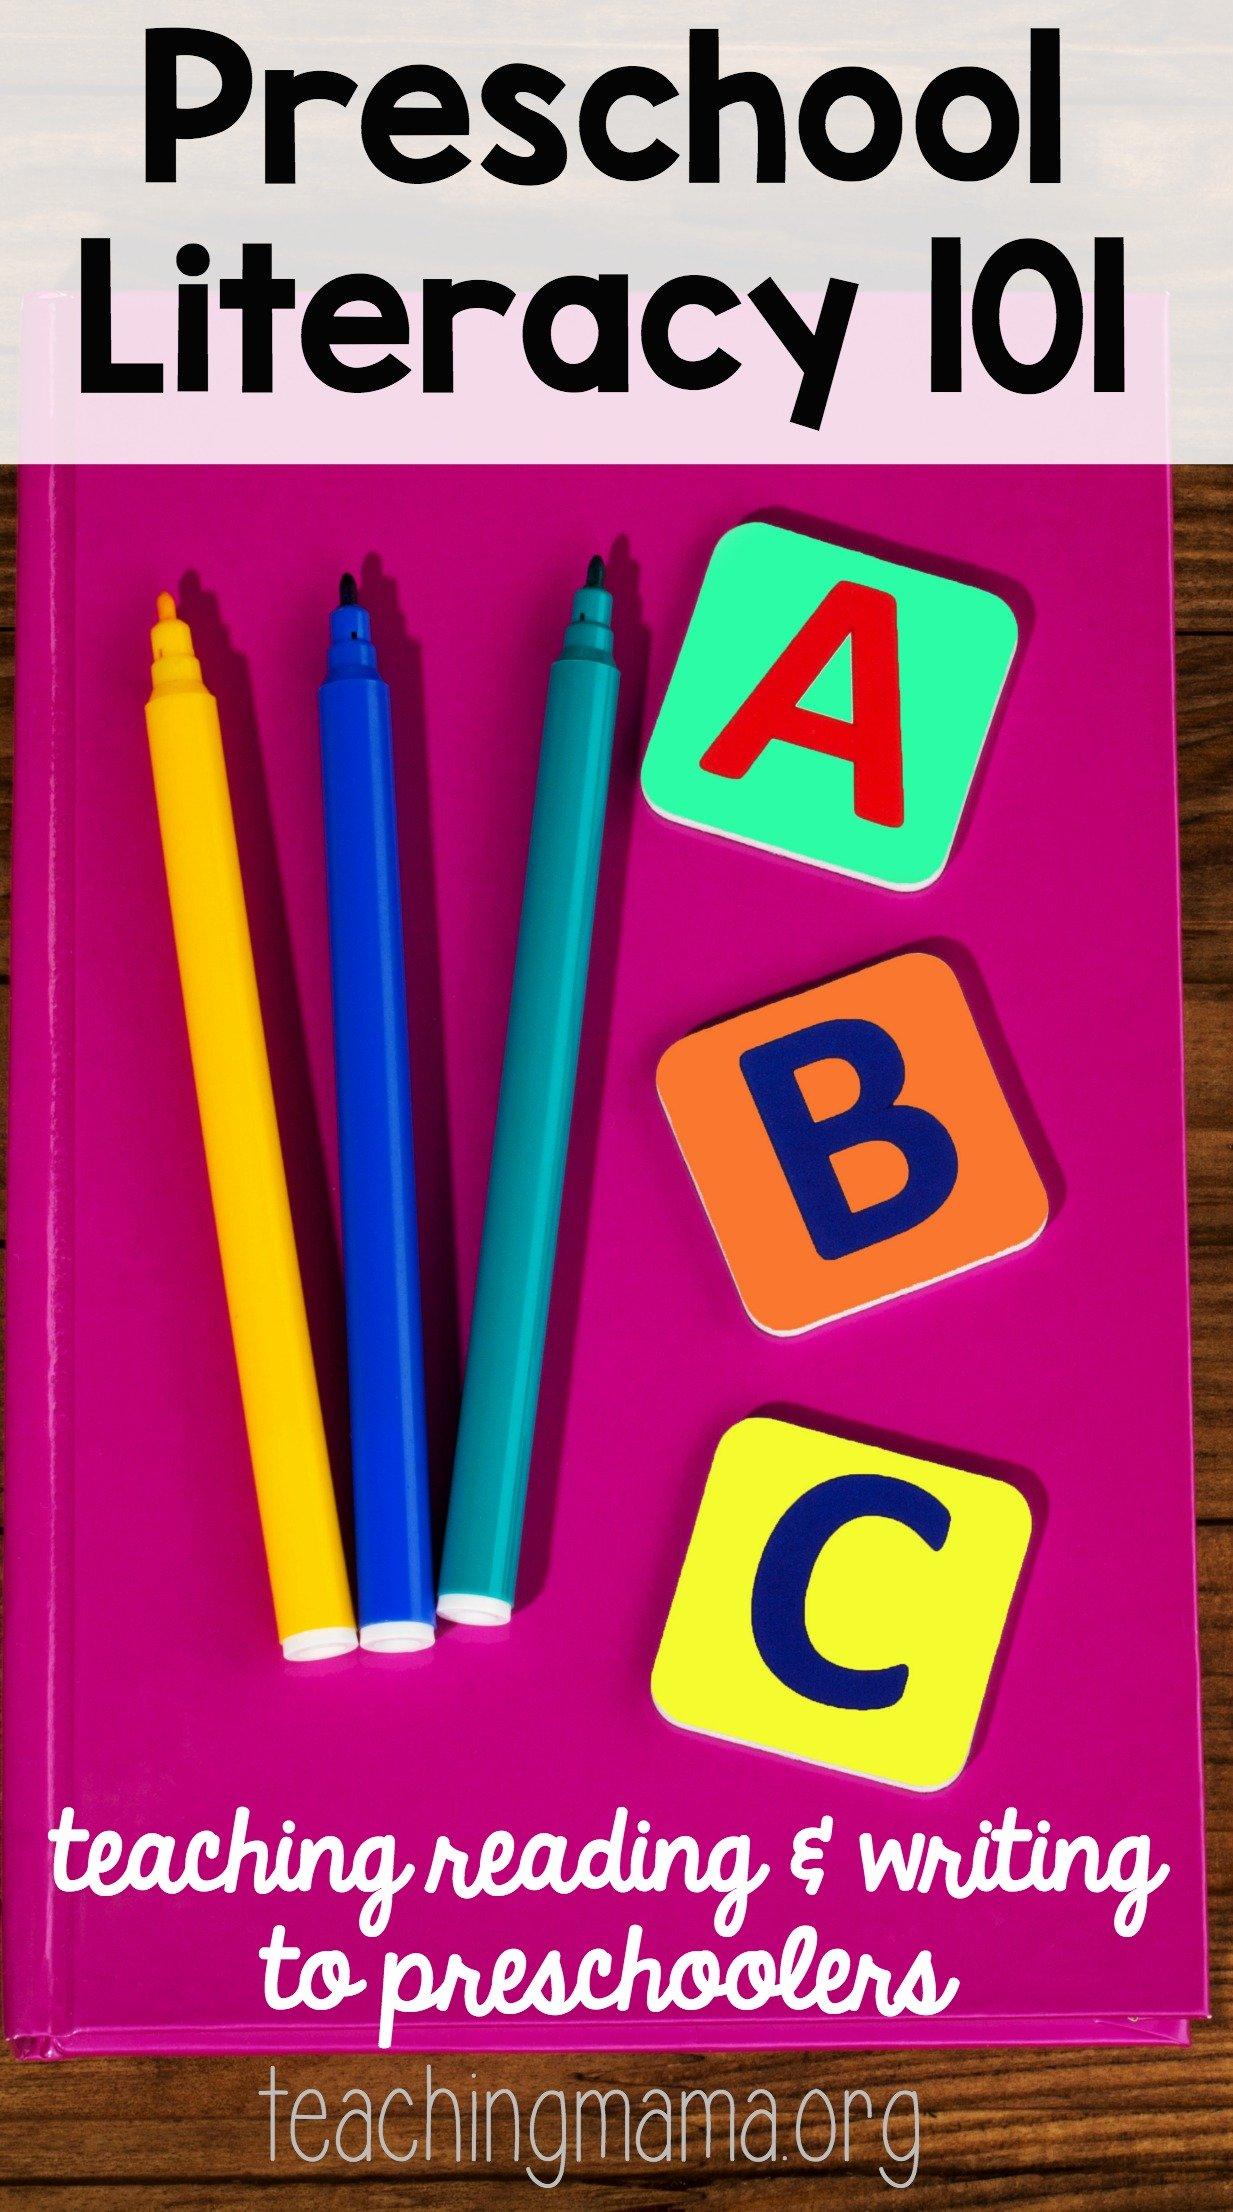 Preschool Literacy 101